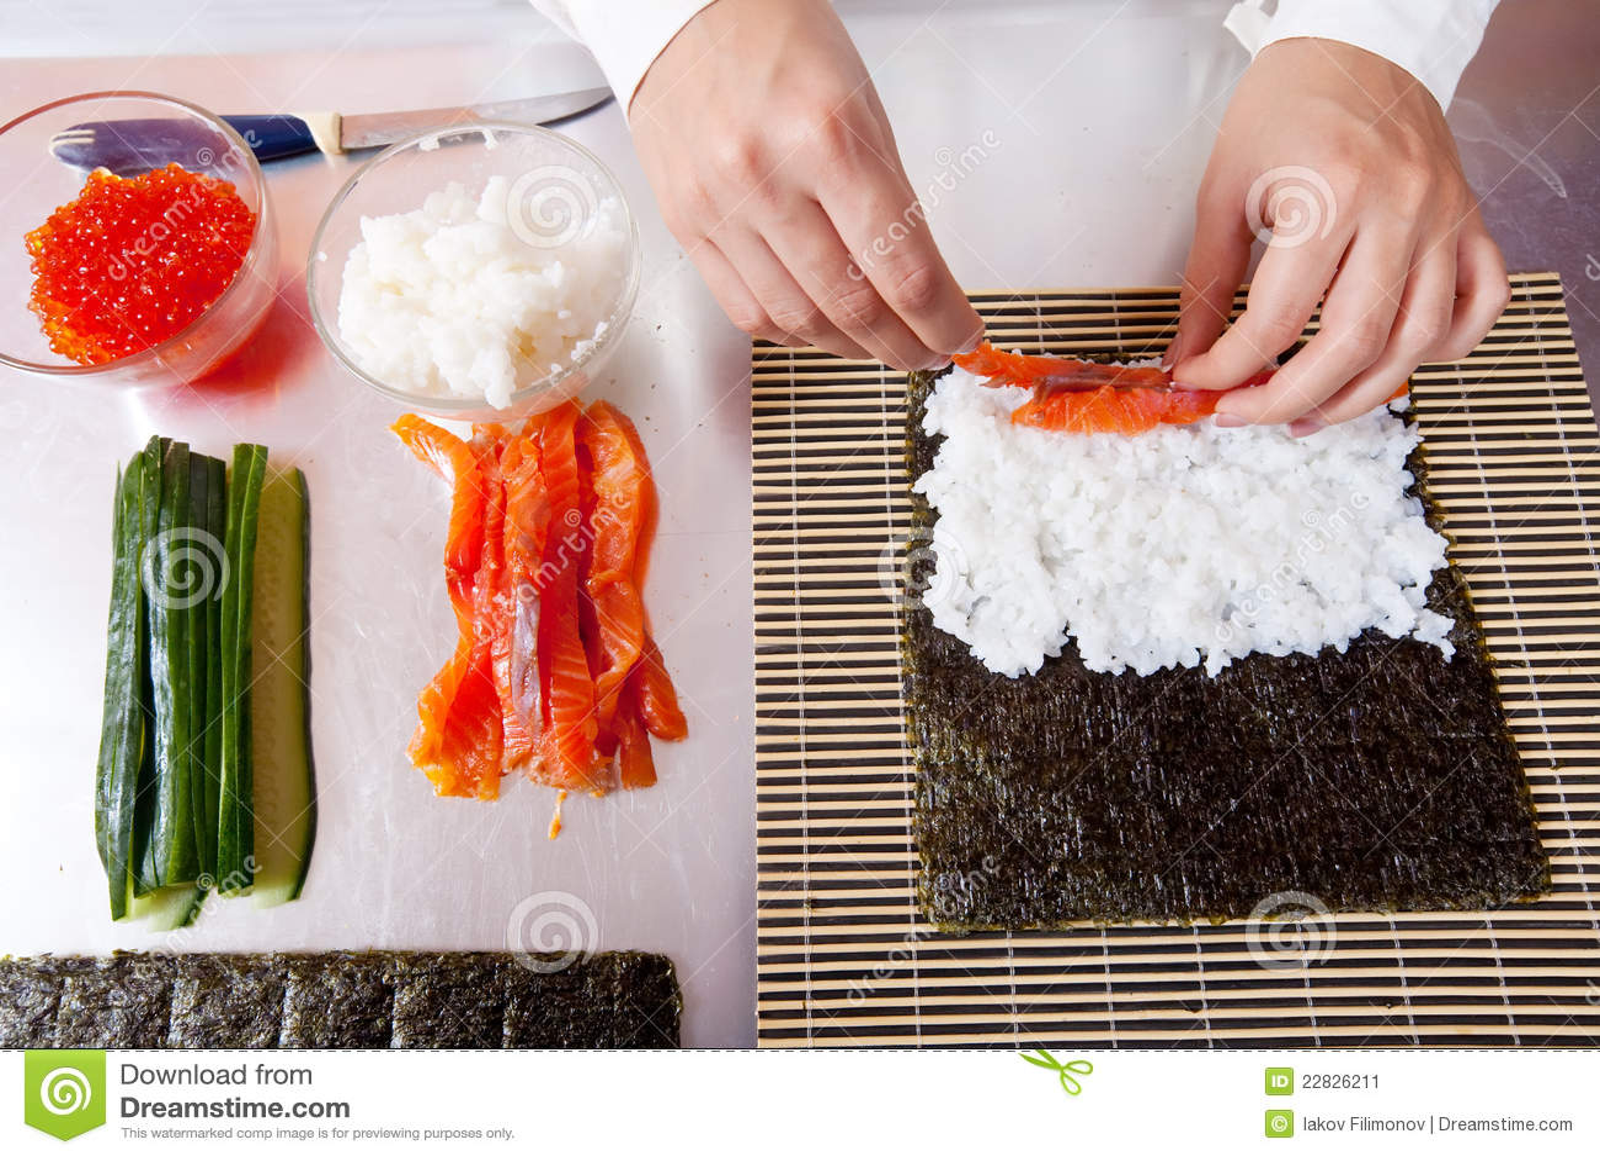 Making Sushi Rolls Stock Image Cartoondealer Com 17435977